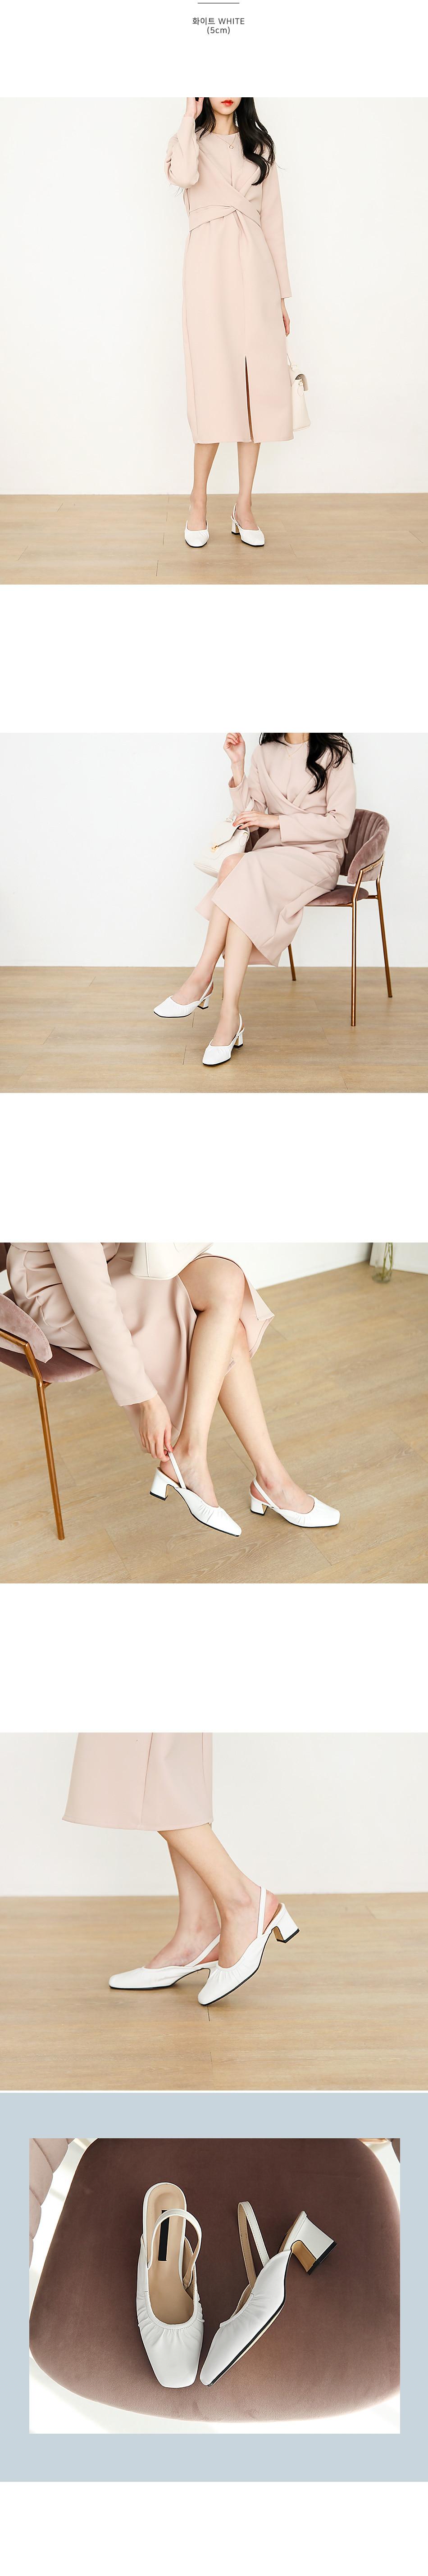 Fivelle Flat & Middle Heel 3,5cm